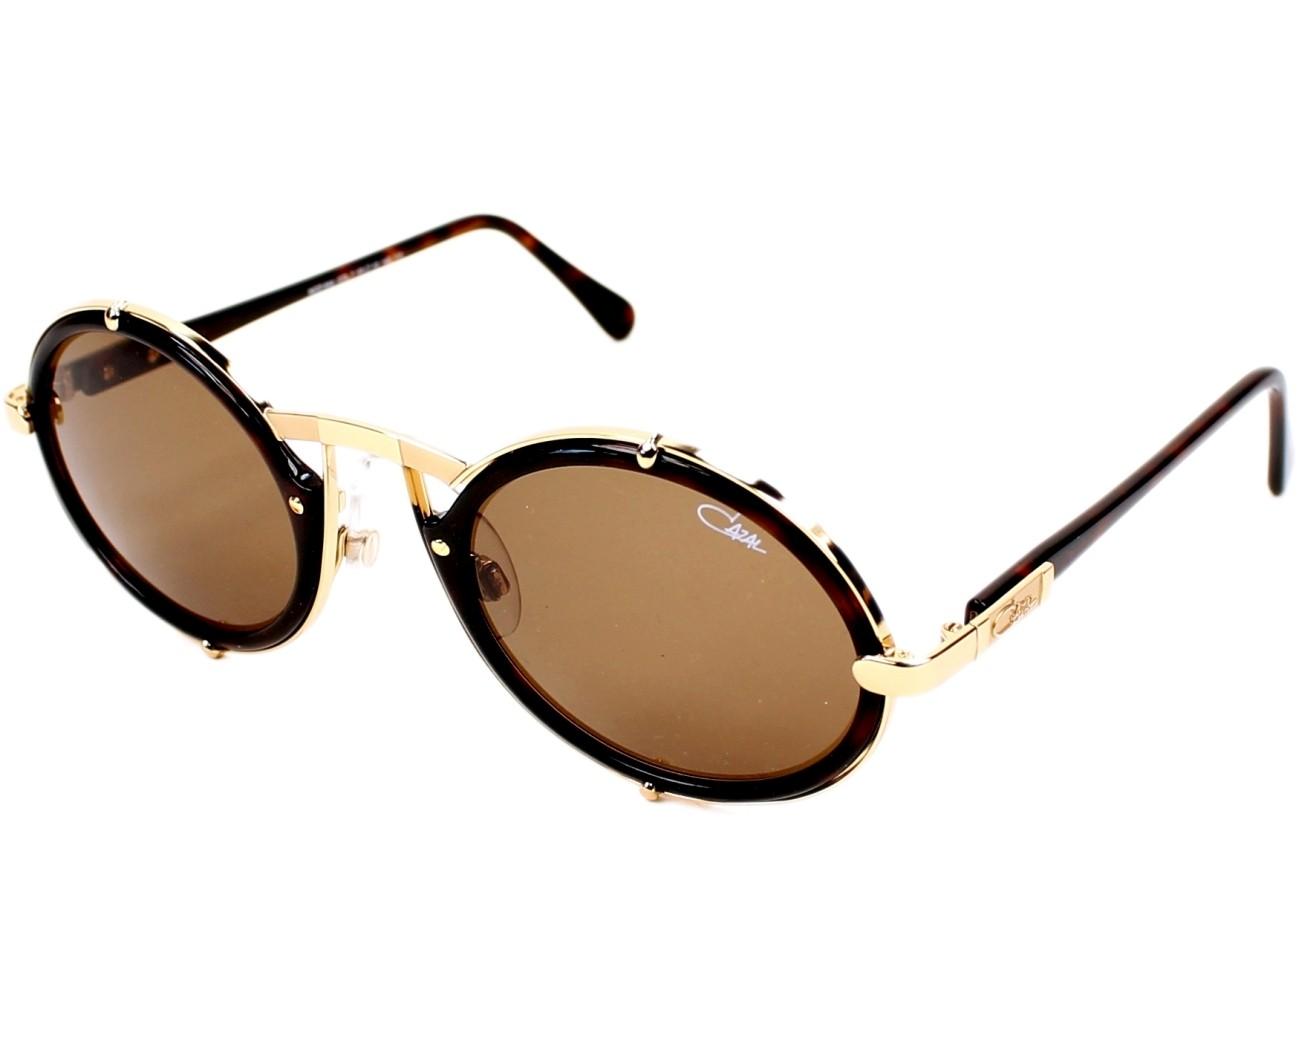 Cazal Sunglasses 644 007 Havana Visionet